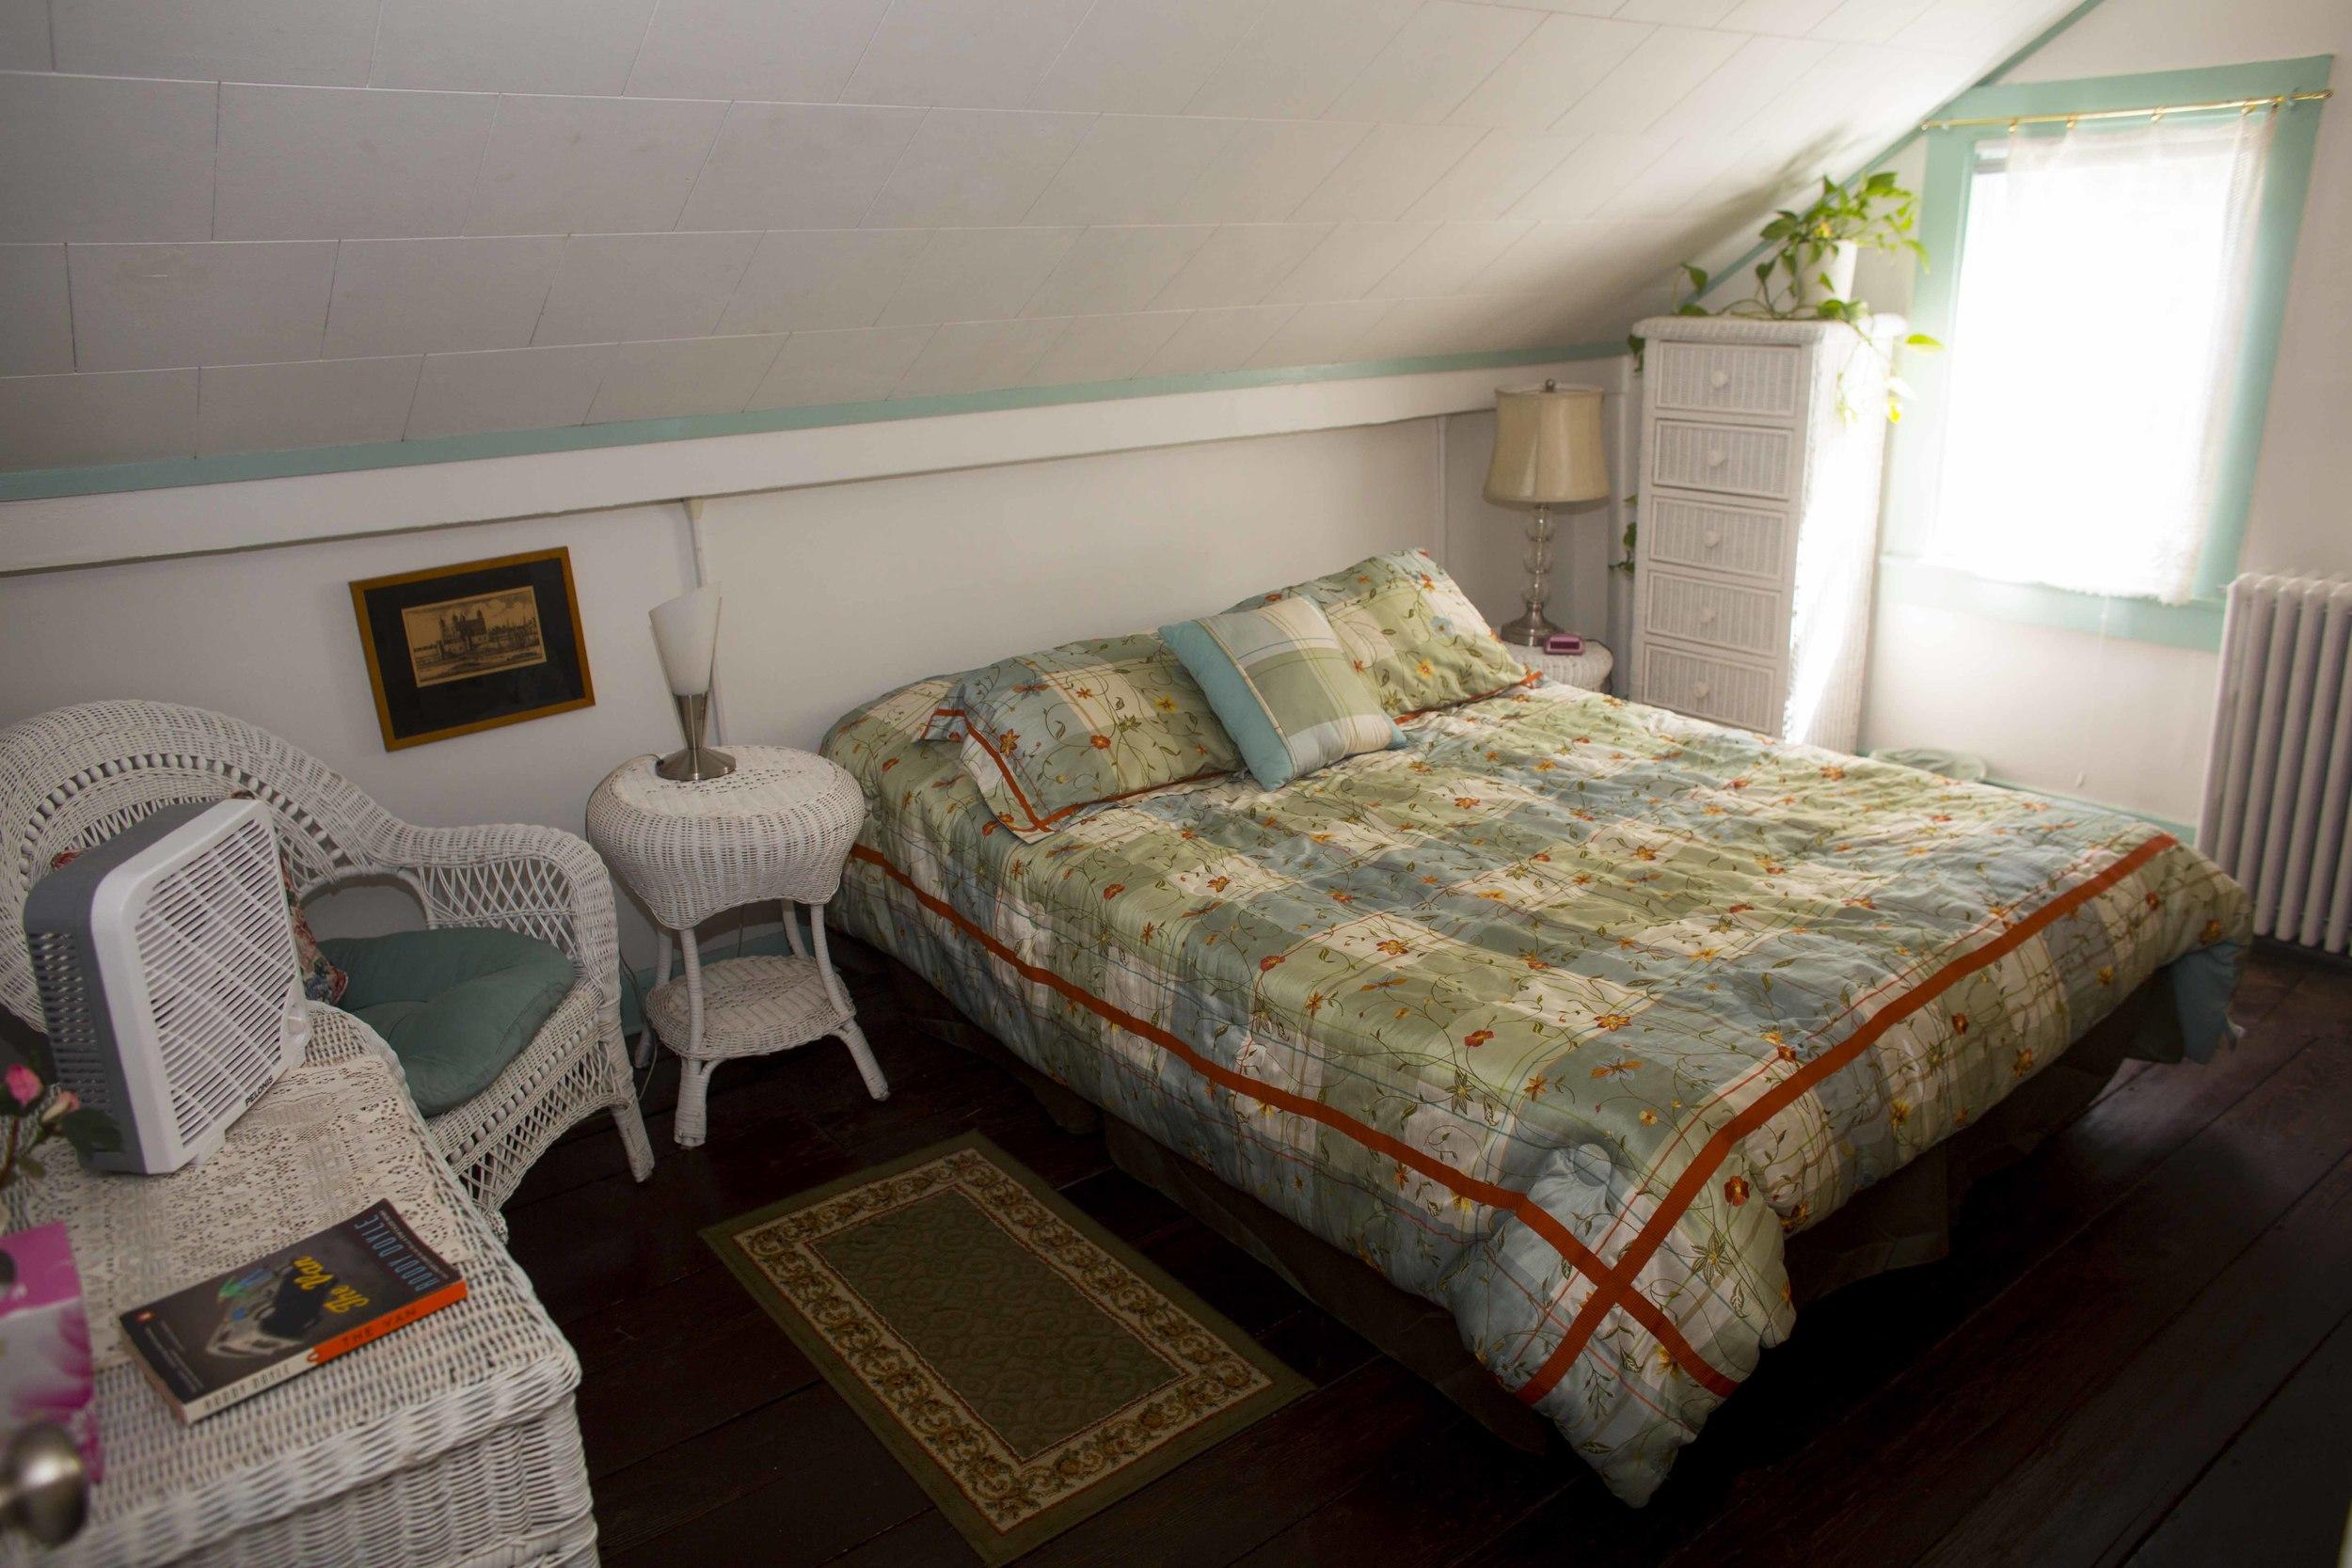 The Quaint Room - Queen Bed